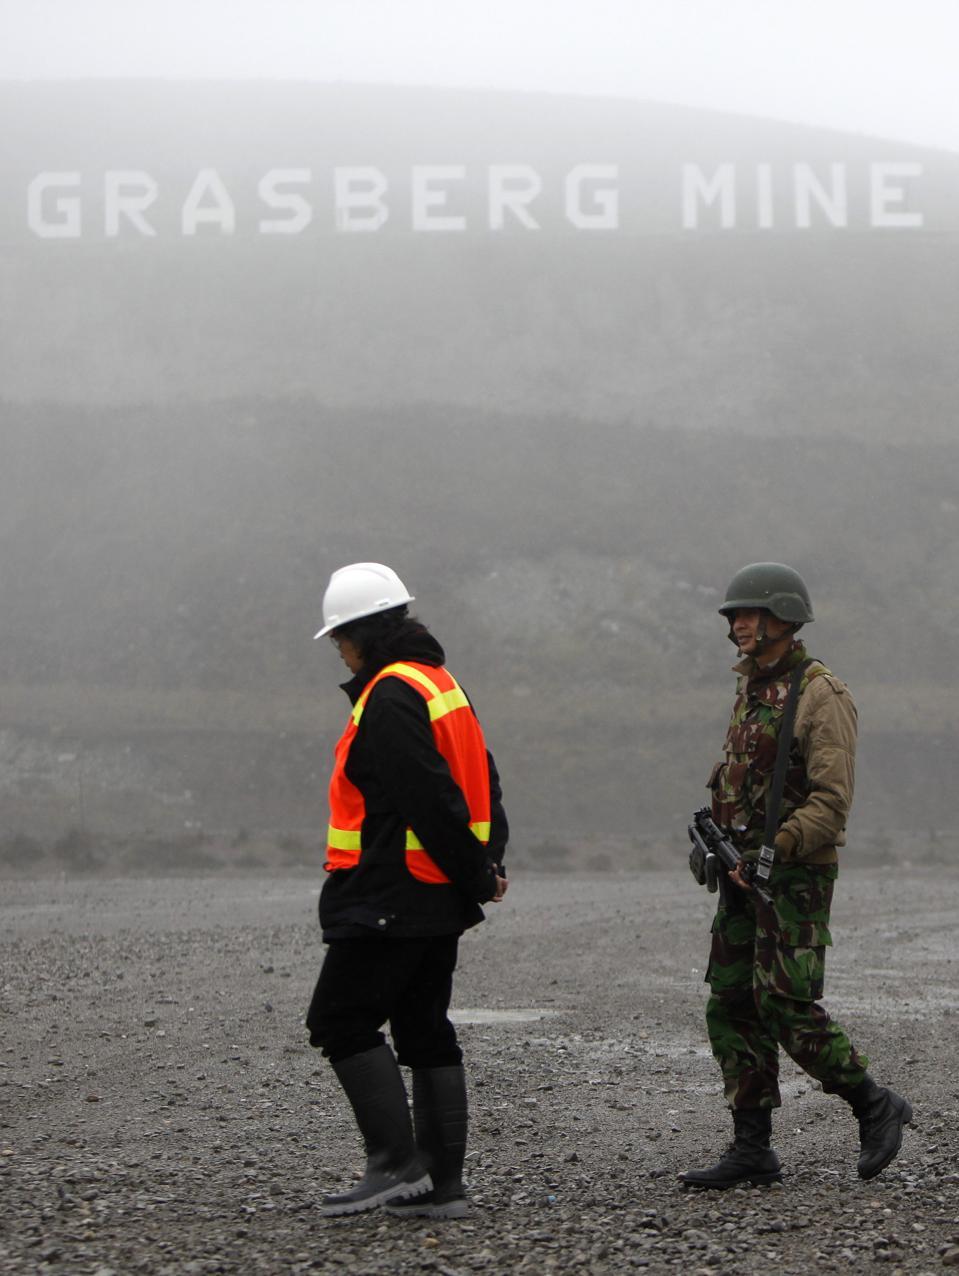 Operations At Freeport-McMoRan Inc.'s Grasberg Gold And Copper Mine